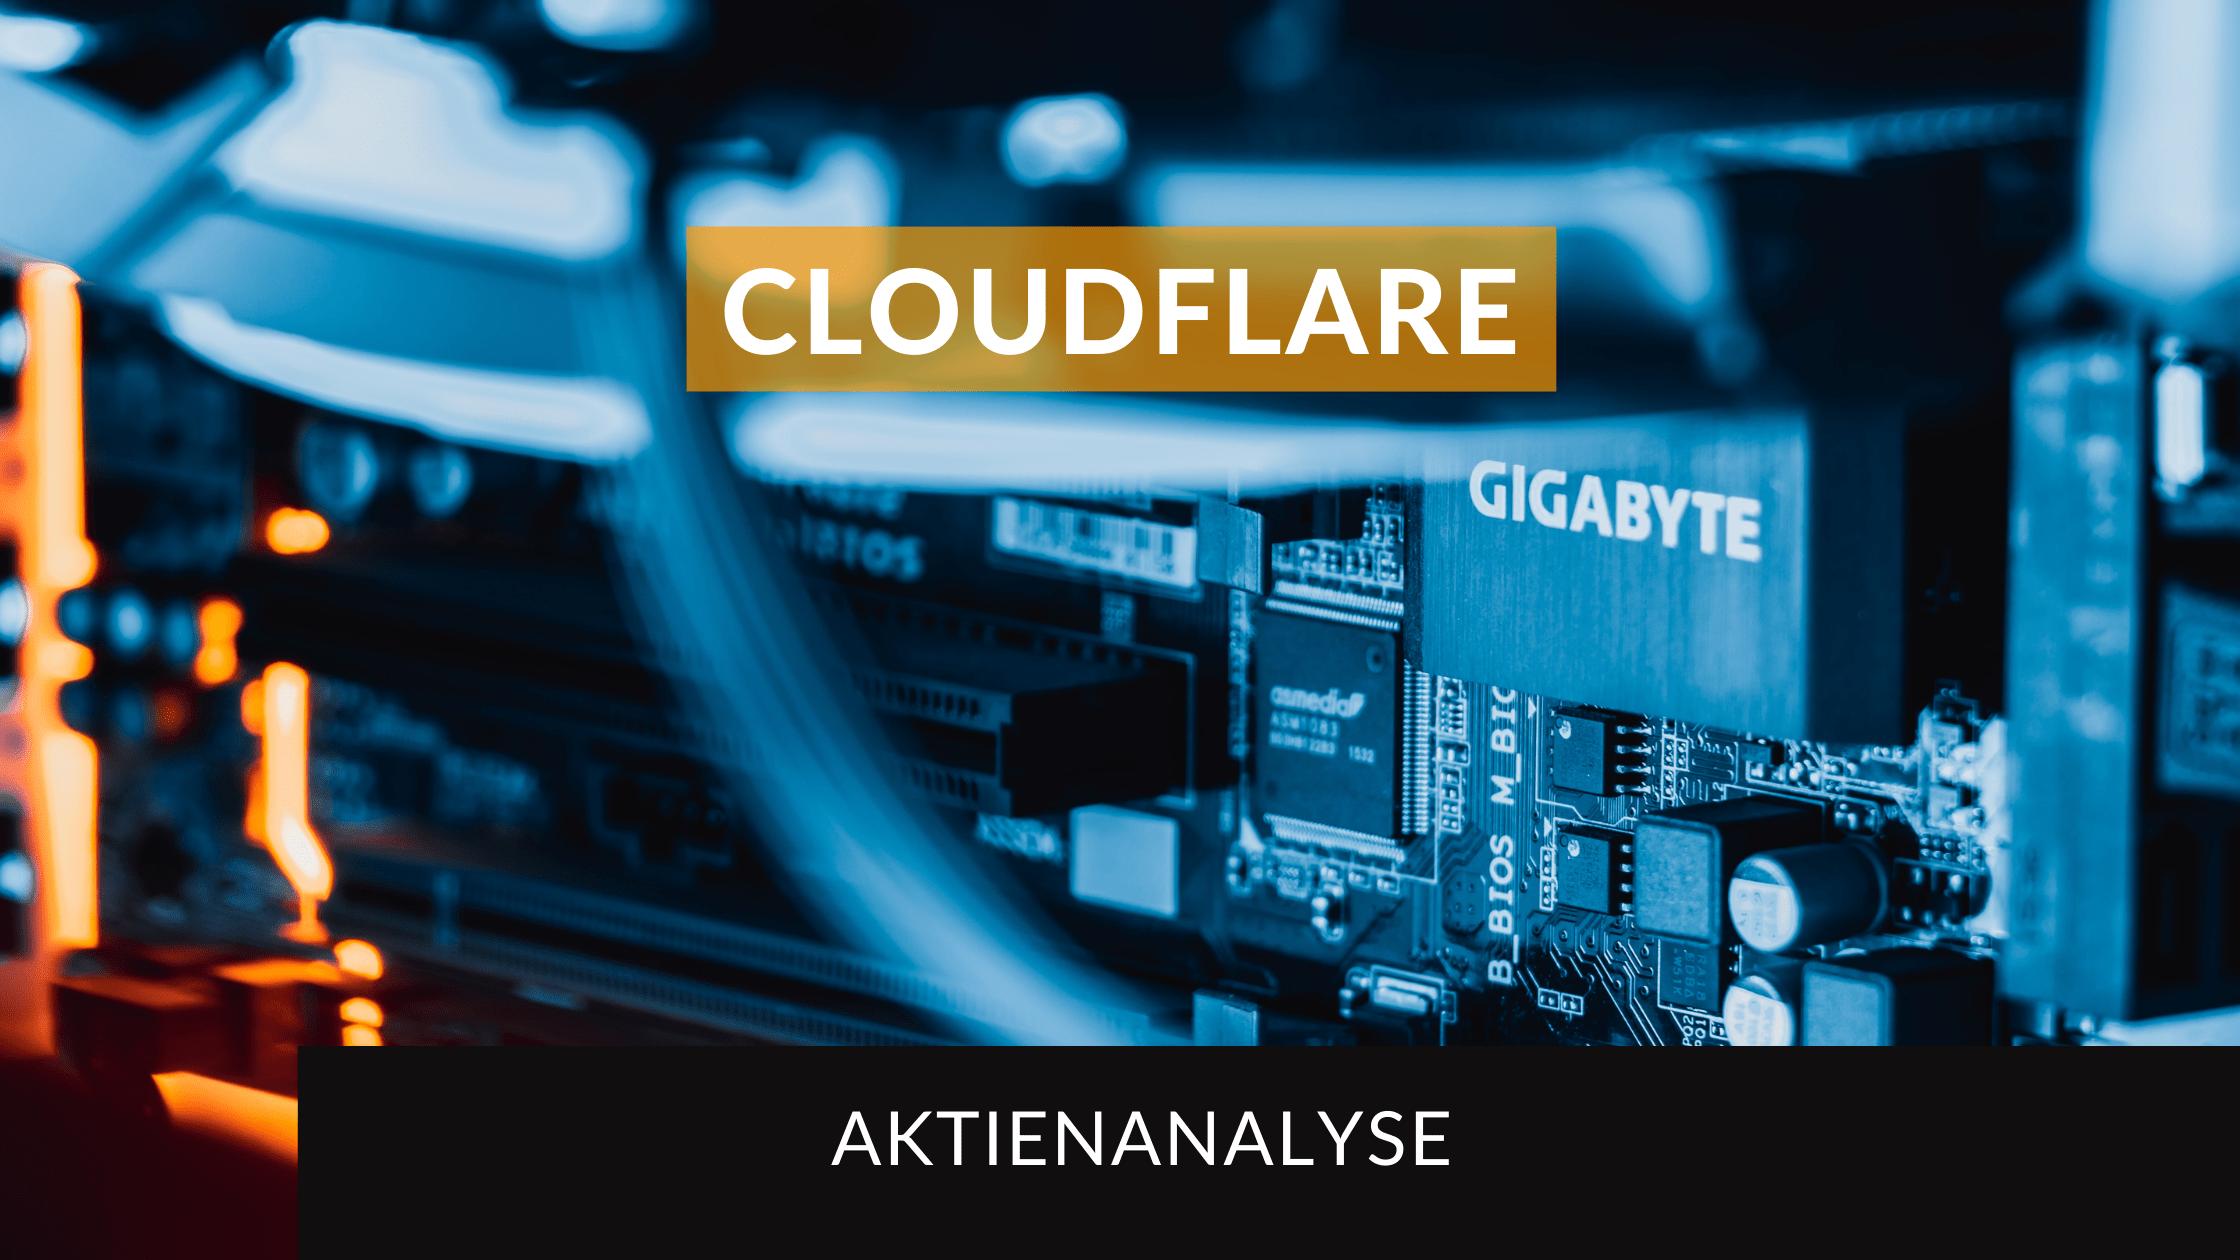 Cloudflare Aktienanalyse